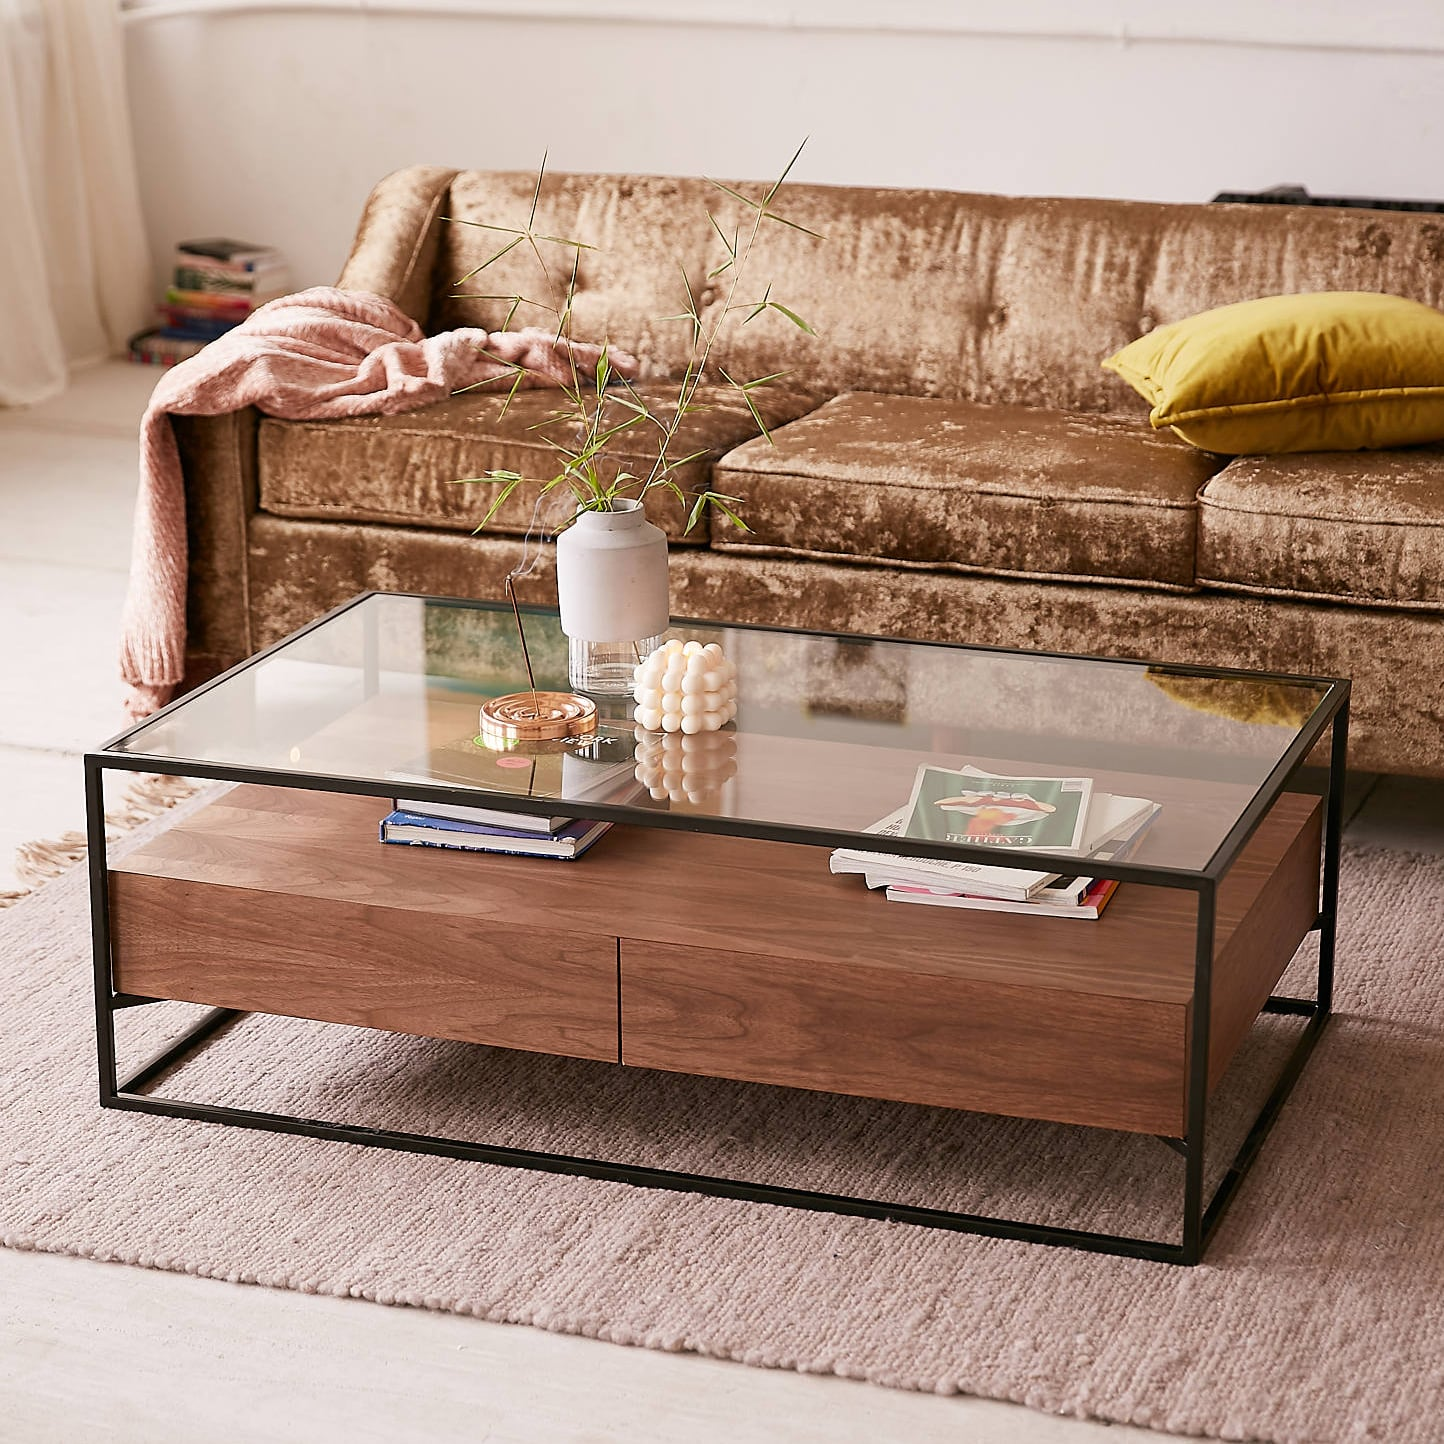 Best Space-Saving Coffee Tables | POPSUGAR Home